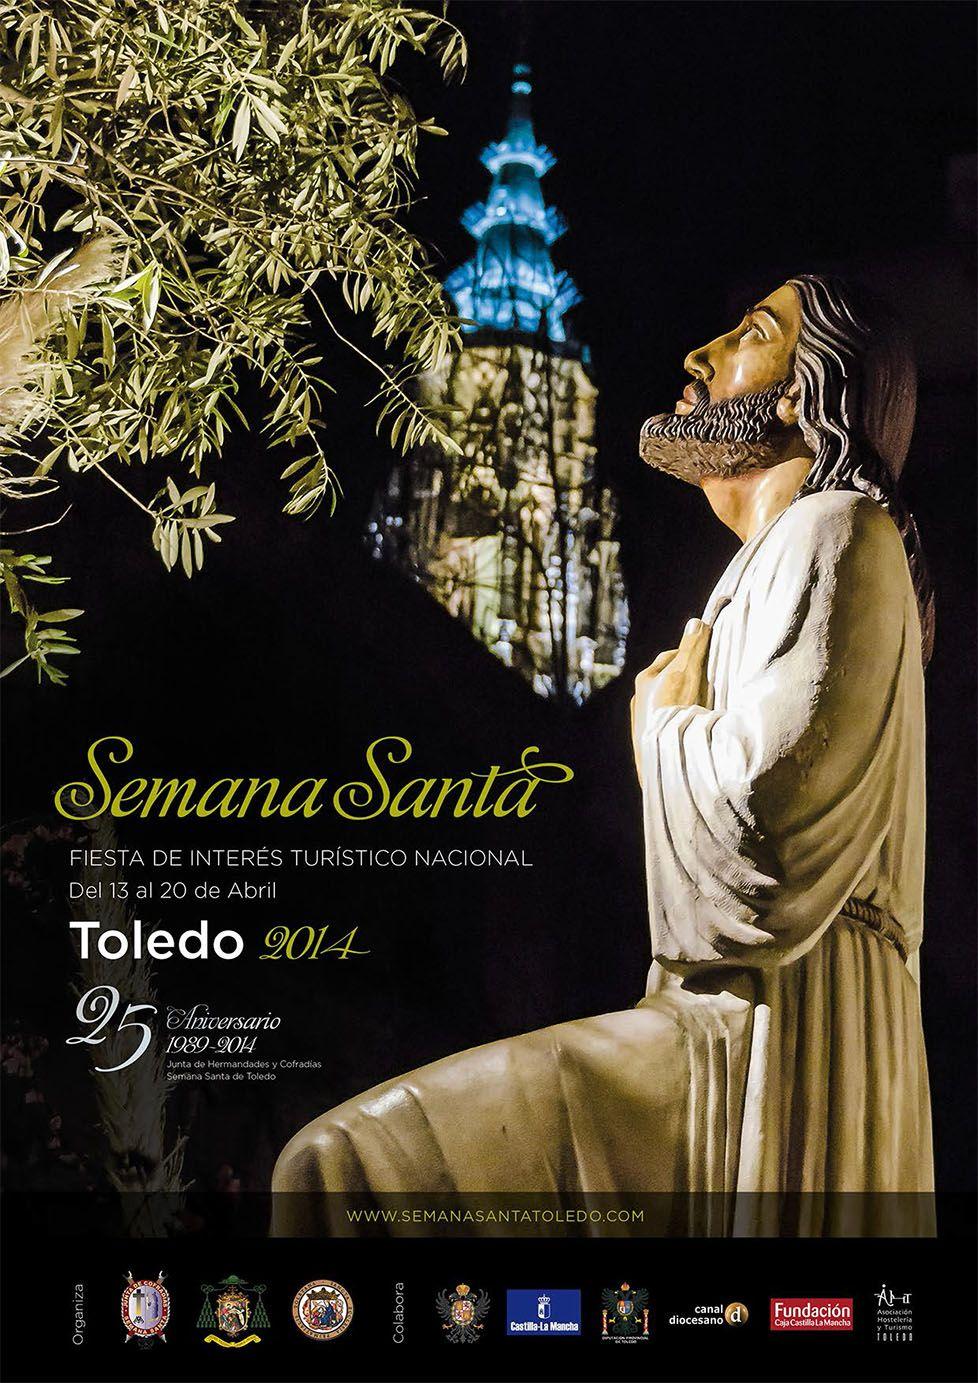 Cartel Semana Santa Toledo 2014 Programación Aquí Http Www Leyendasdetoledo Com Index Php Articulos Ferias Y Fiestas 5740 Semana Semana Santa Toledo Santos